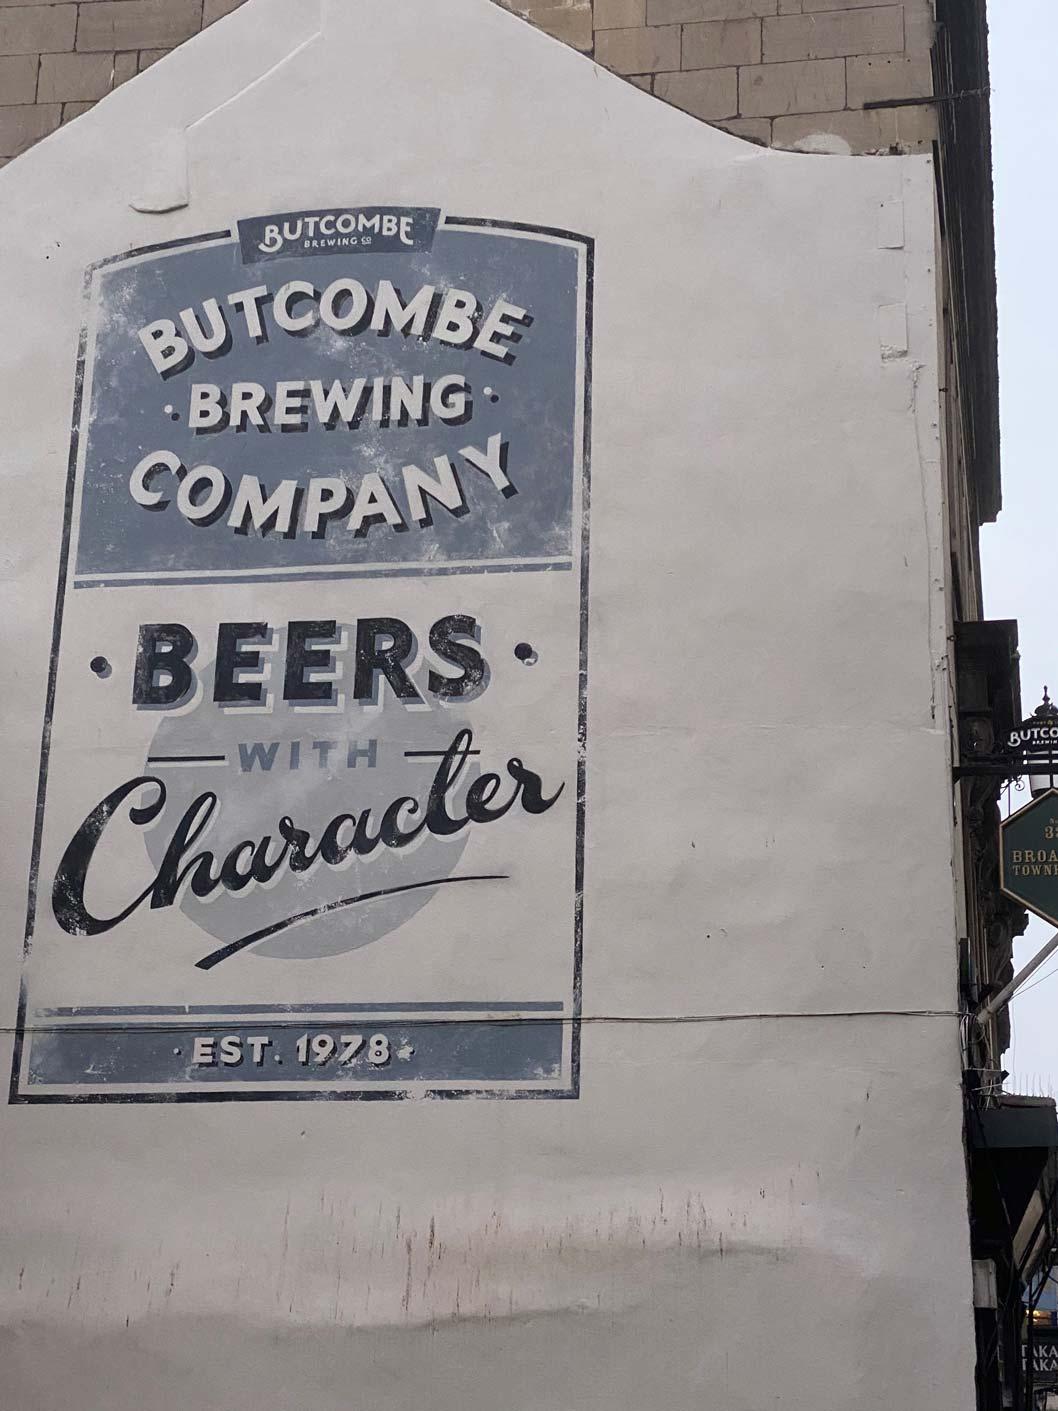 Butcombe Brewing Company